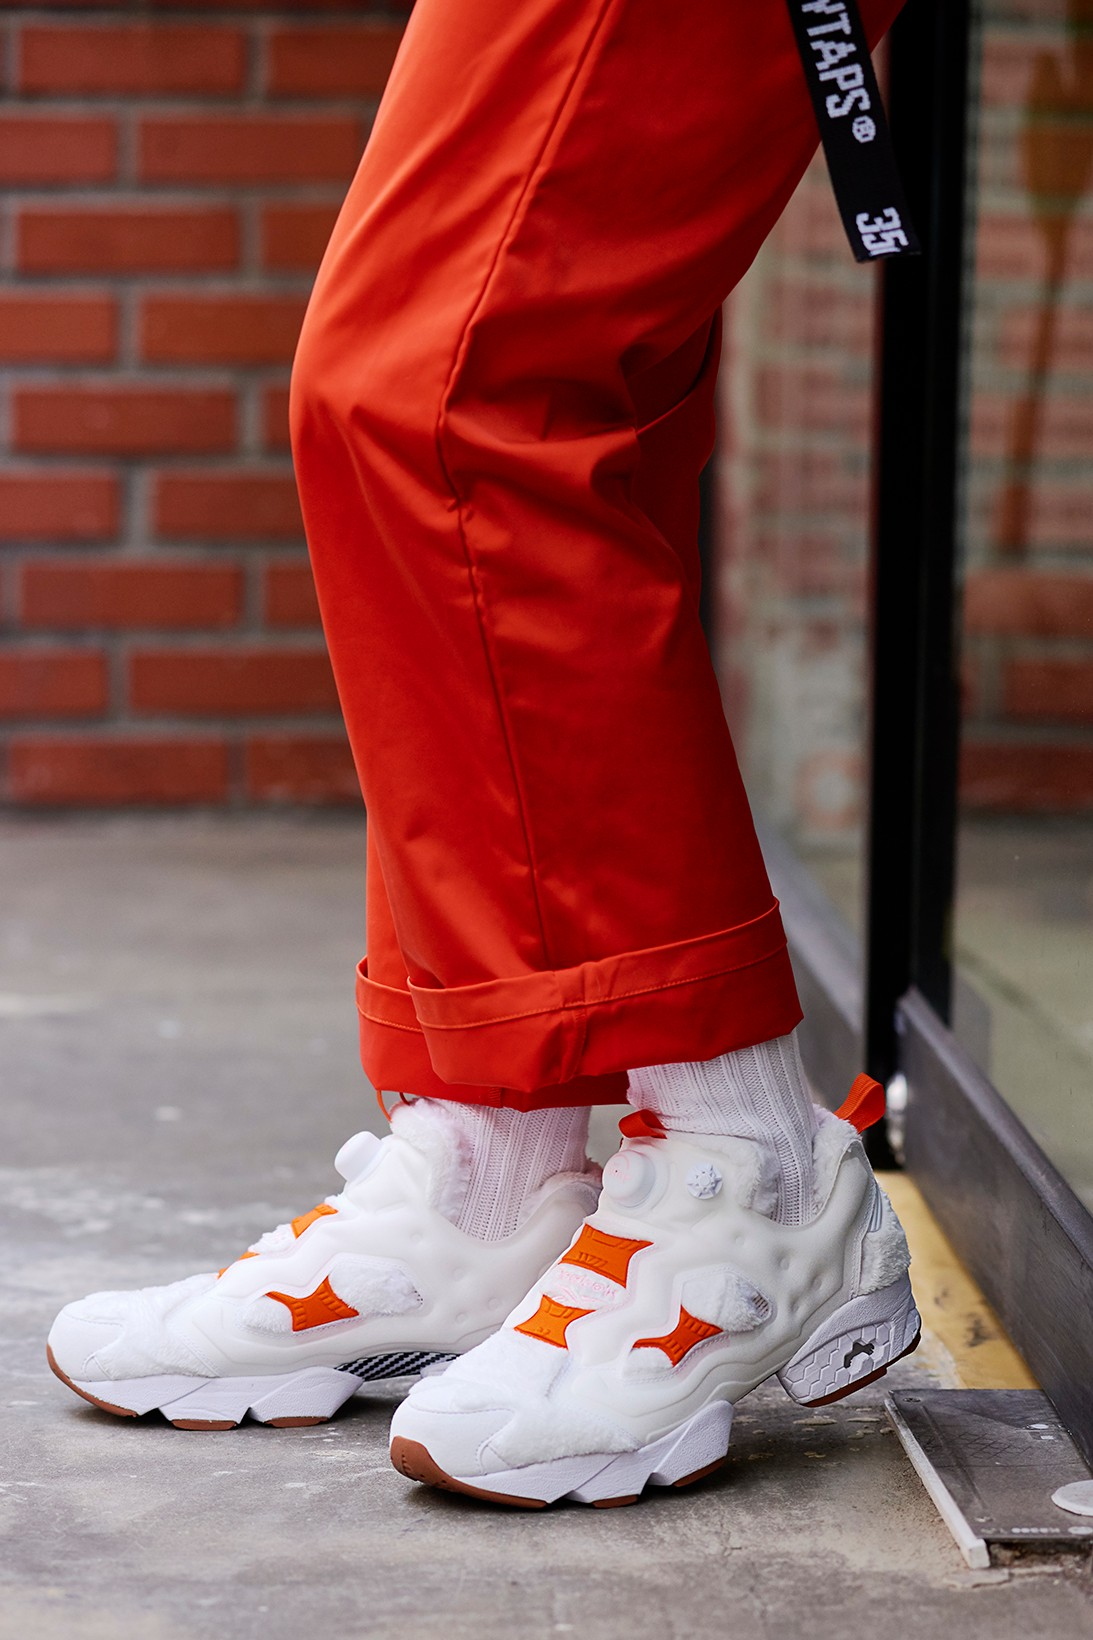 Fructífero limpiar Injusto  BT21 LINE FRIENDS x Reebok Instapump Fury Sneakers | HYPEBAE